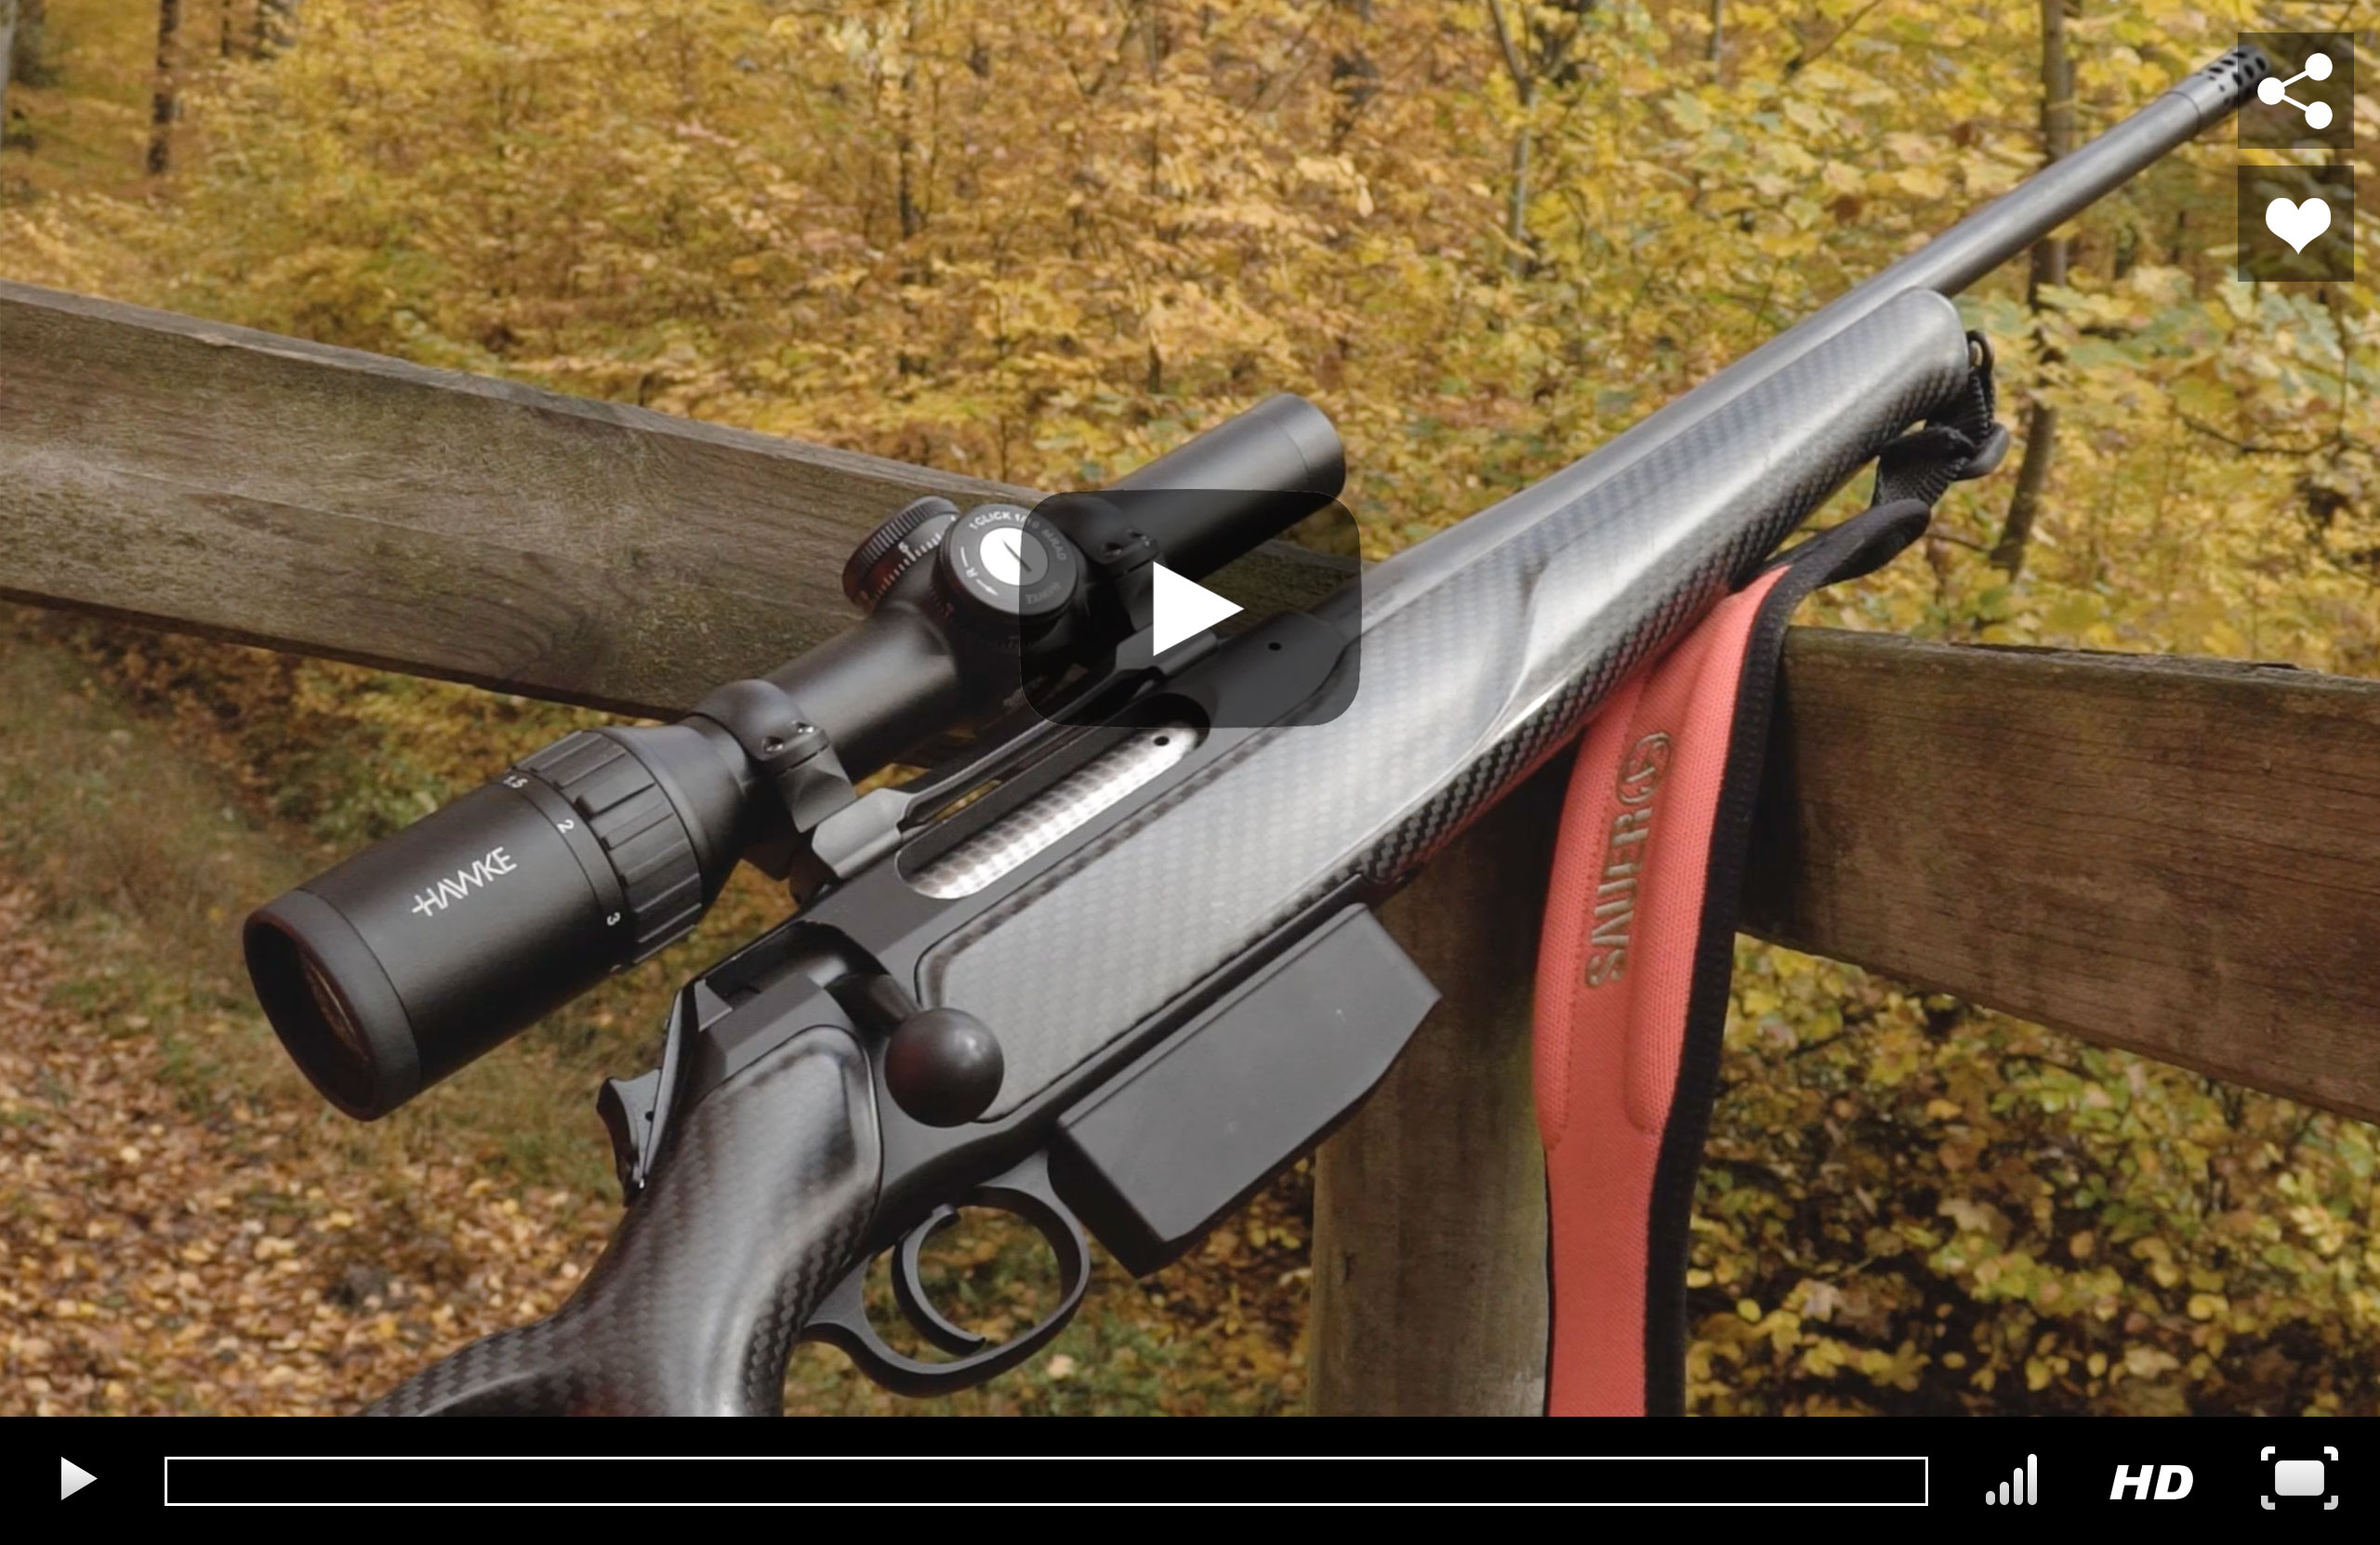 Wild Boar Hunting Germany Equipment